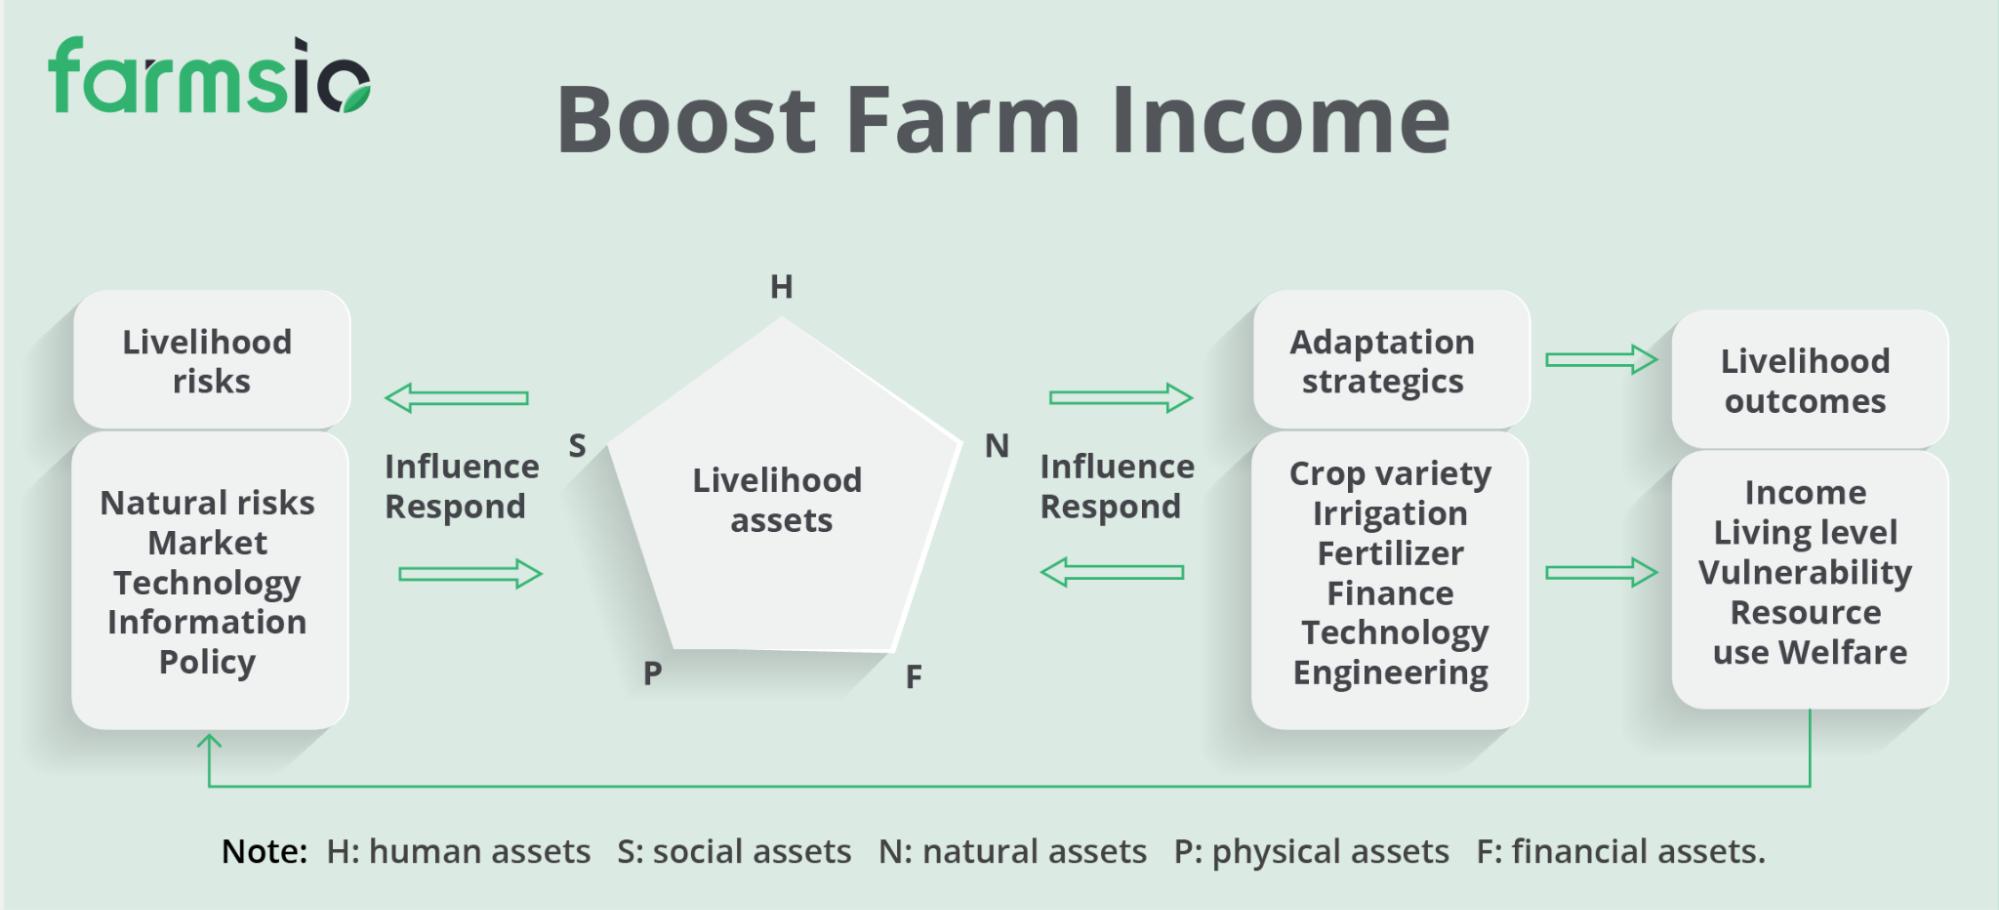 Boost Farmer's income through Farmsio's FMS - Marketplace Module